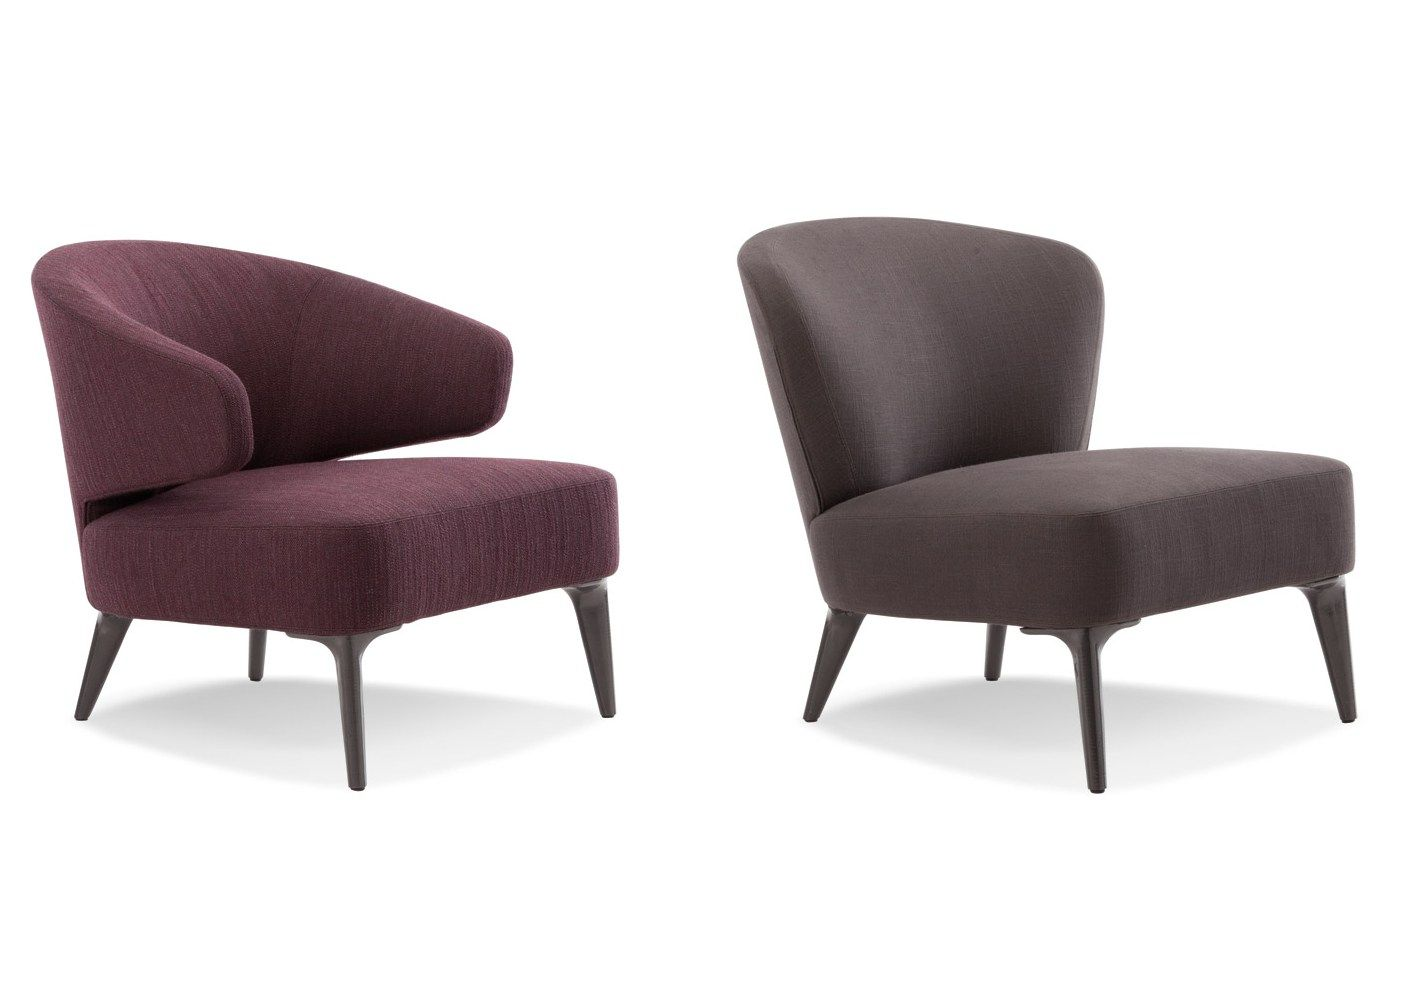 minotti sofas australia how do you repair a torn leather sofa aston by design rodolfo dordoni home interjöör